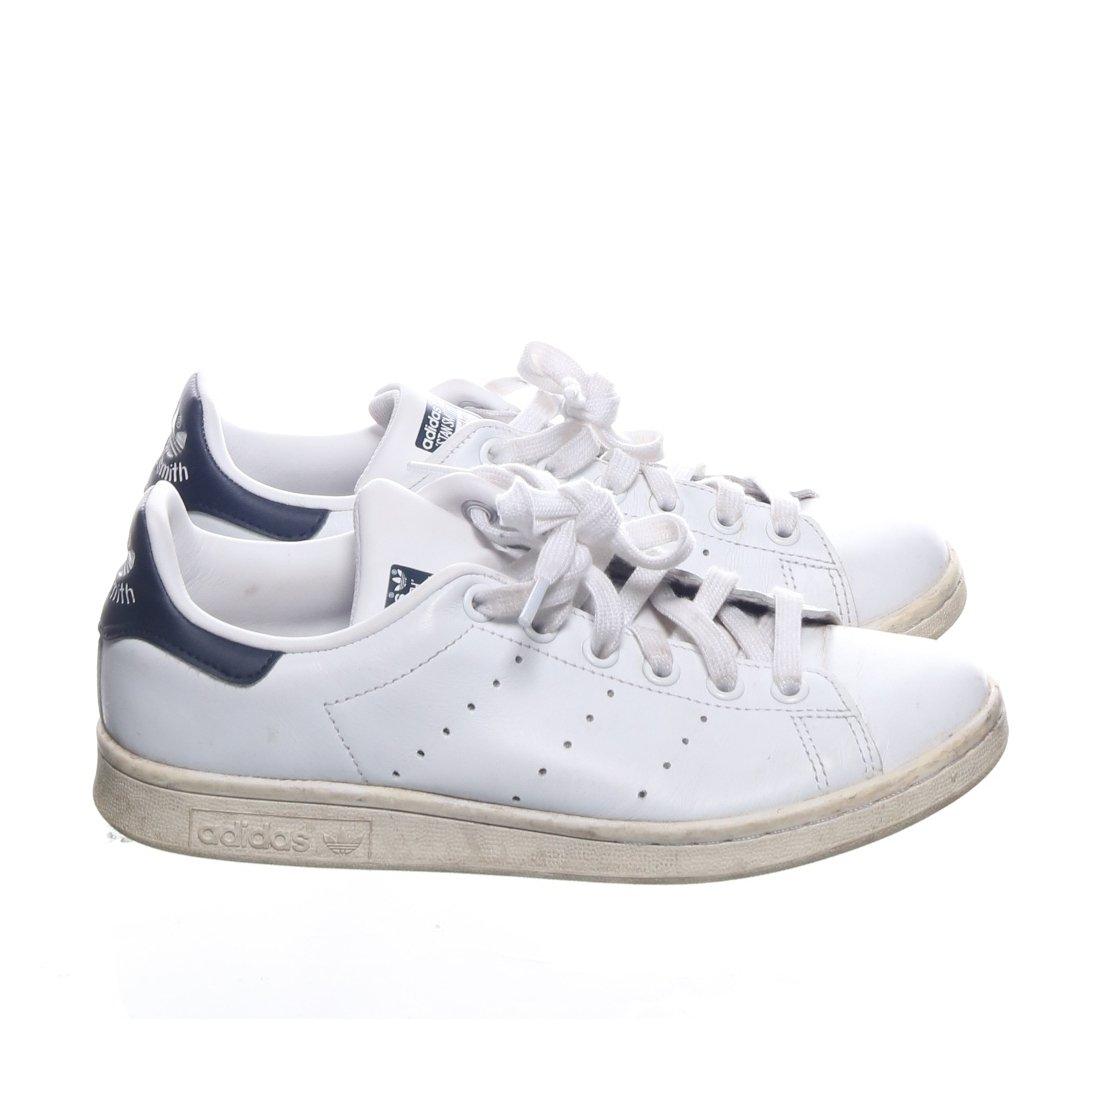 stan smith adidas 37 5